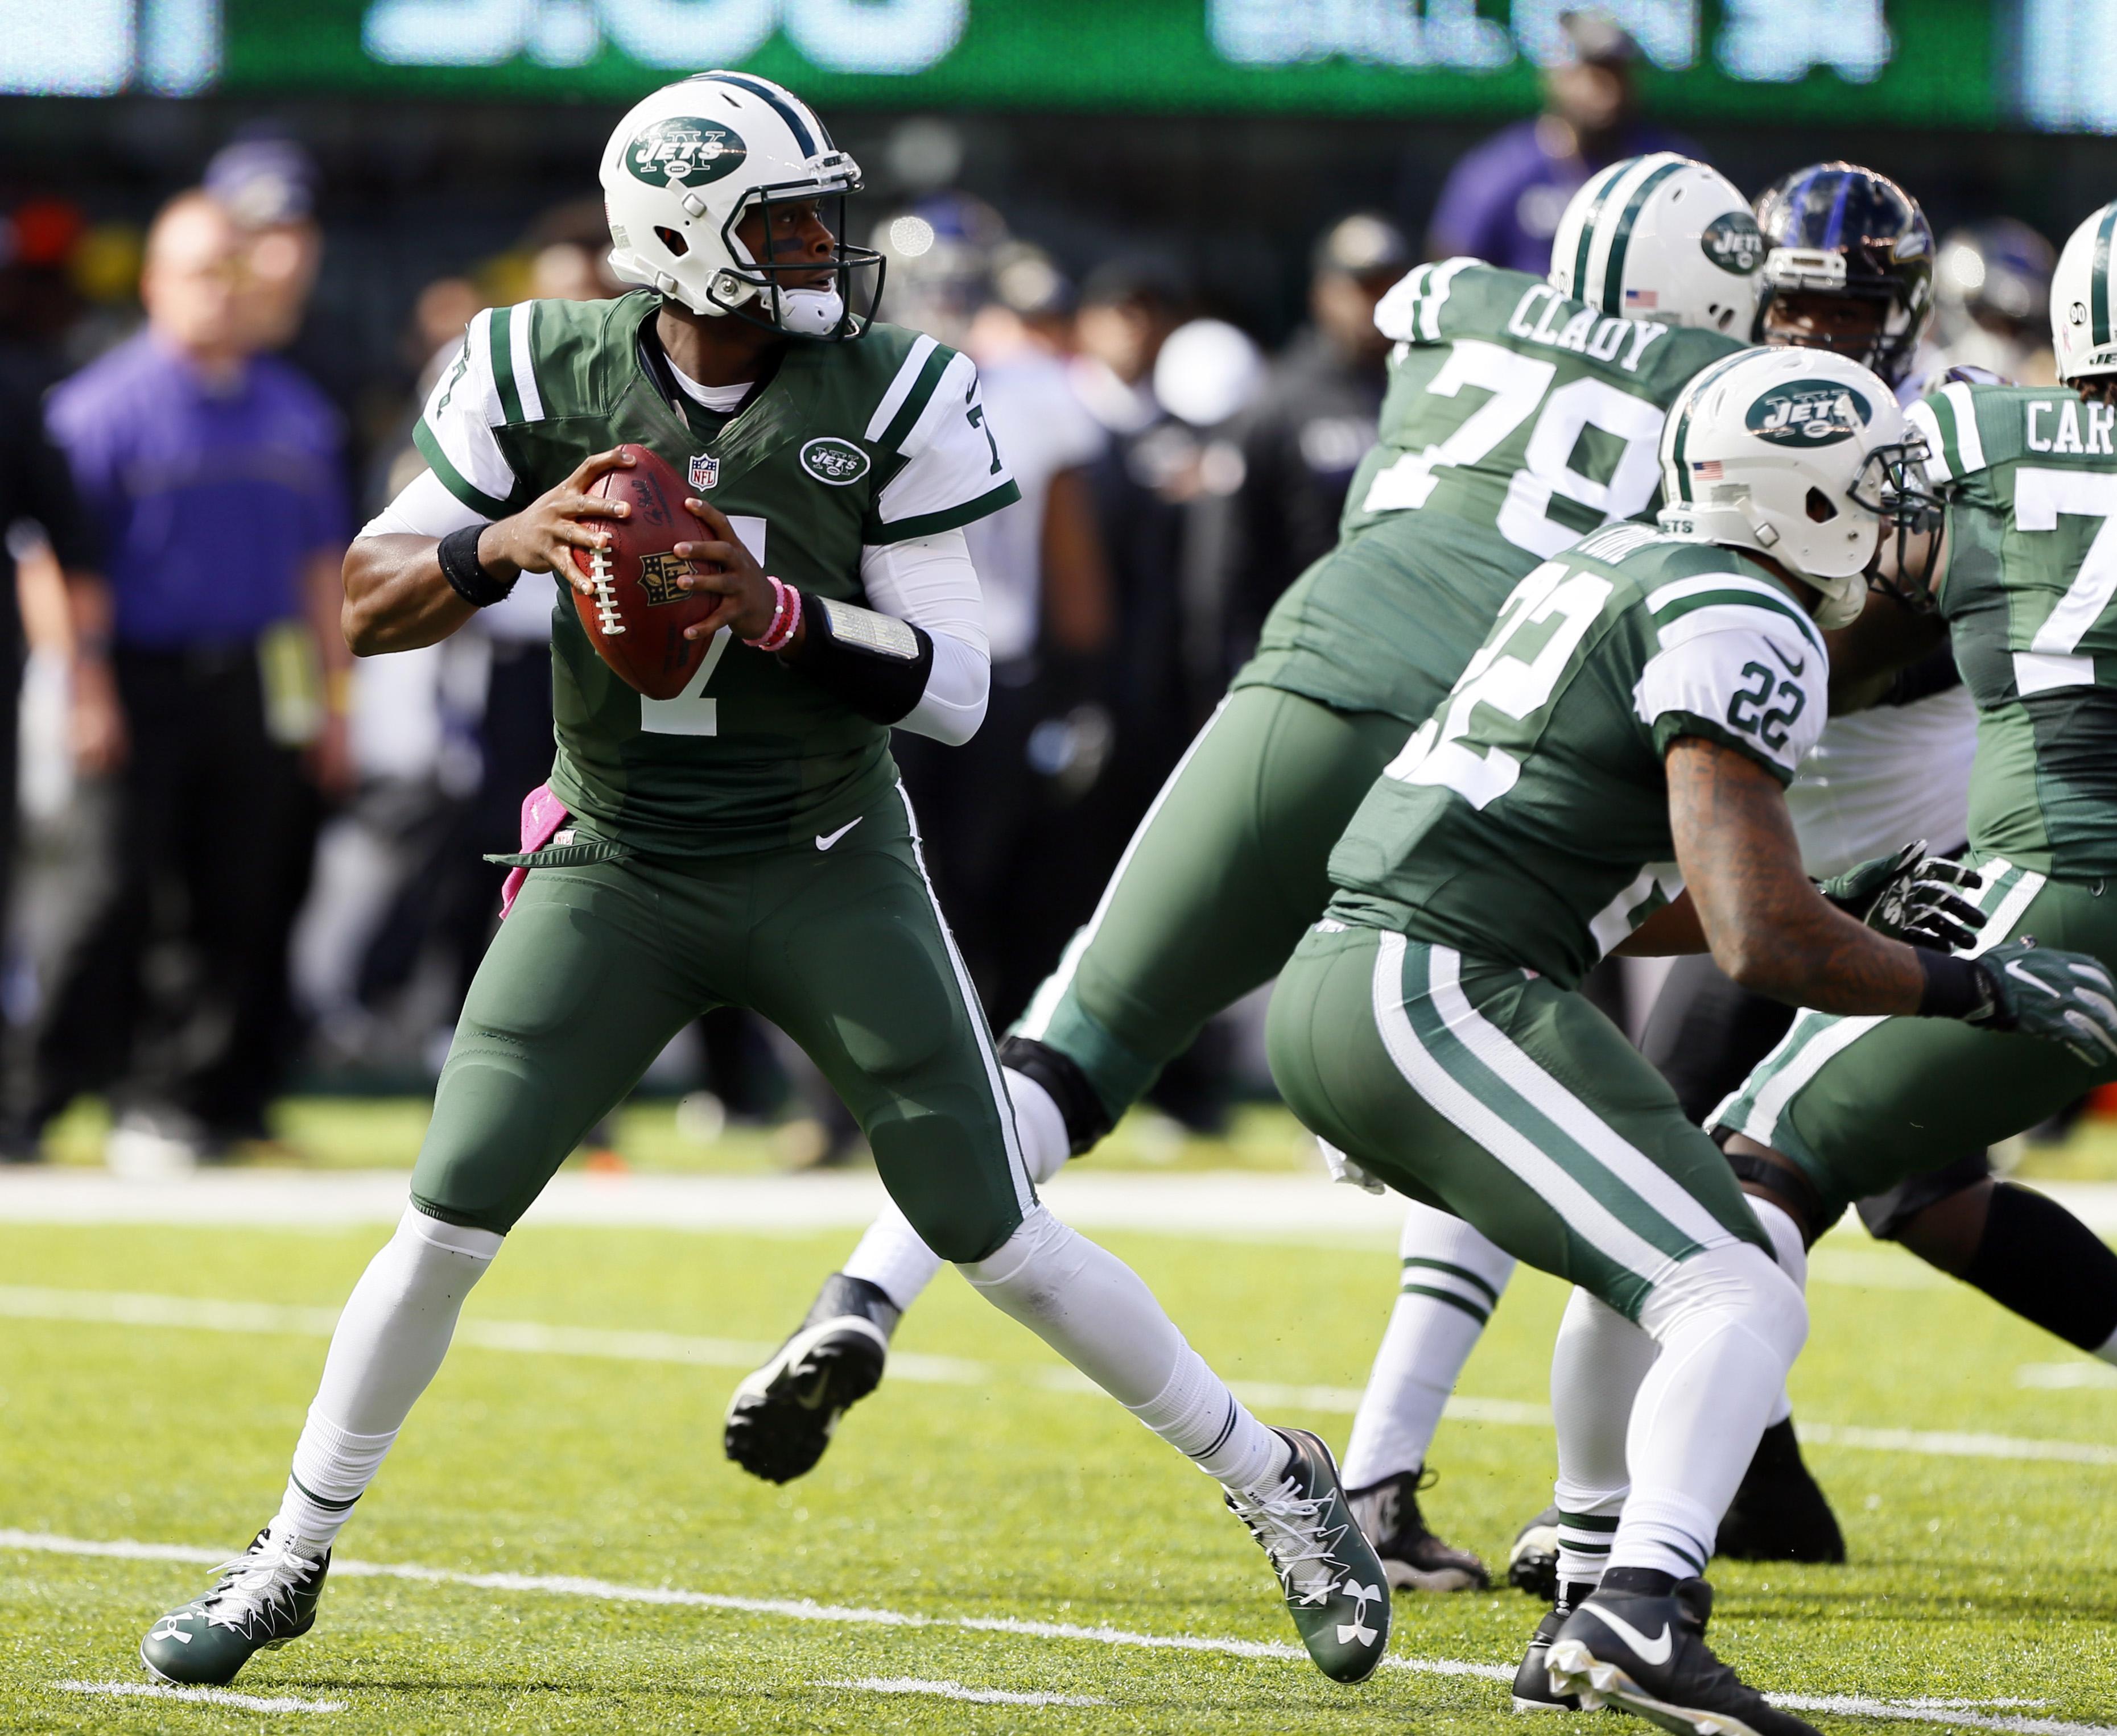 NFL: Baltimore Ravens at New York Jets